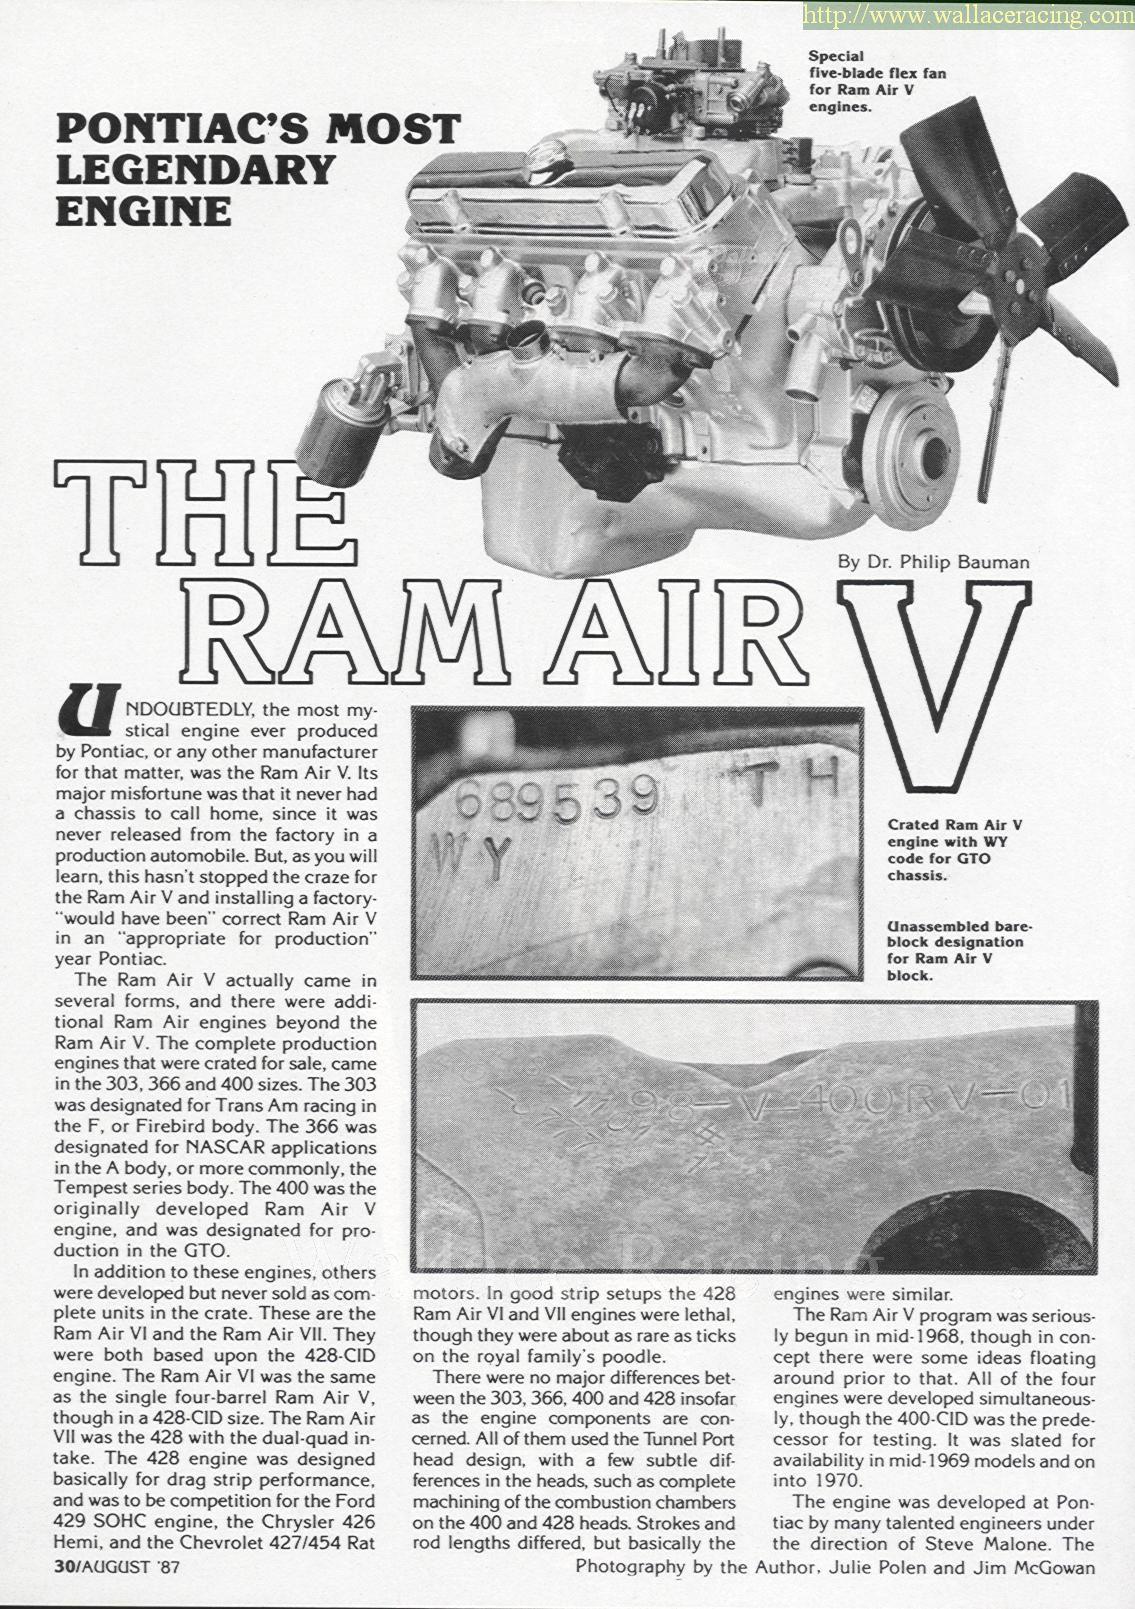 Pontiac Ram Air V Story - Wallace Racing